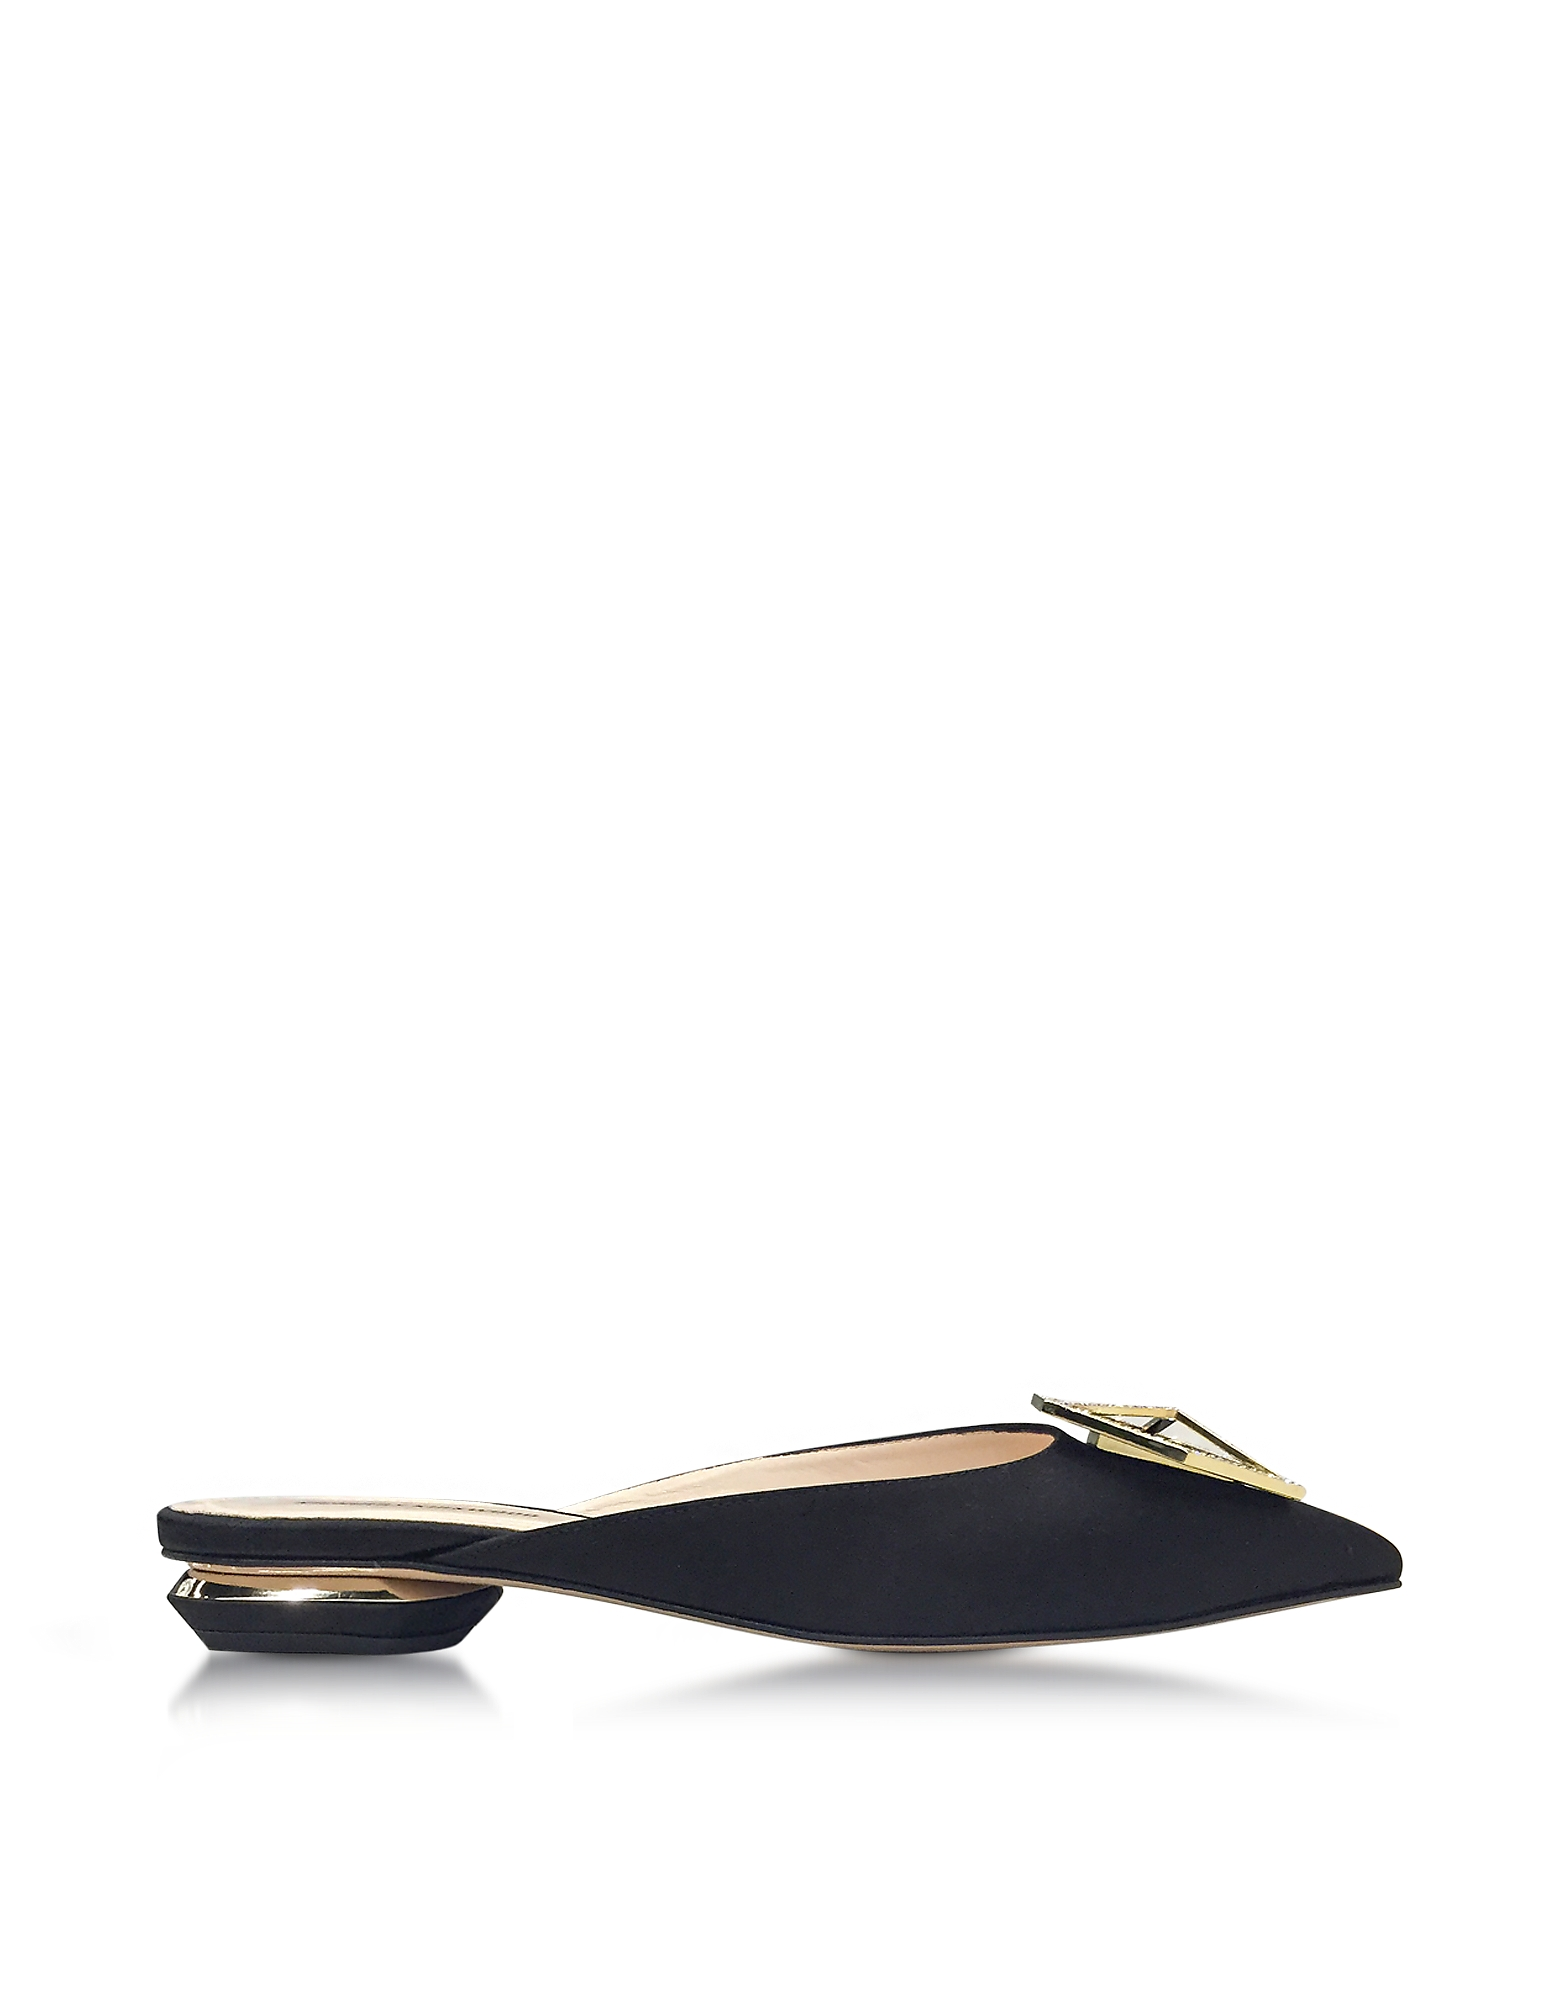 Nicholas Kirkwood Shoes, Eden Black Satin Jewel Mule